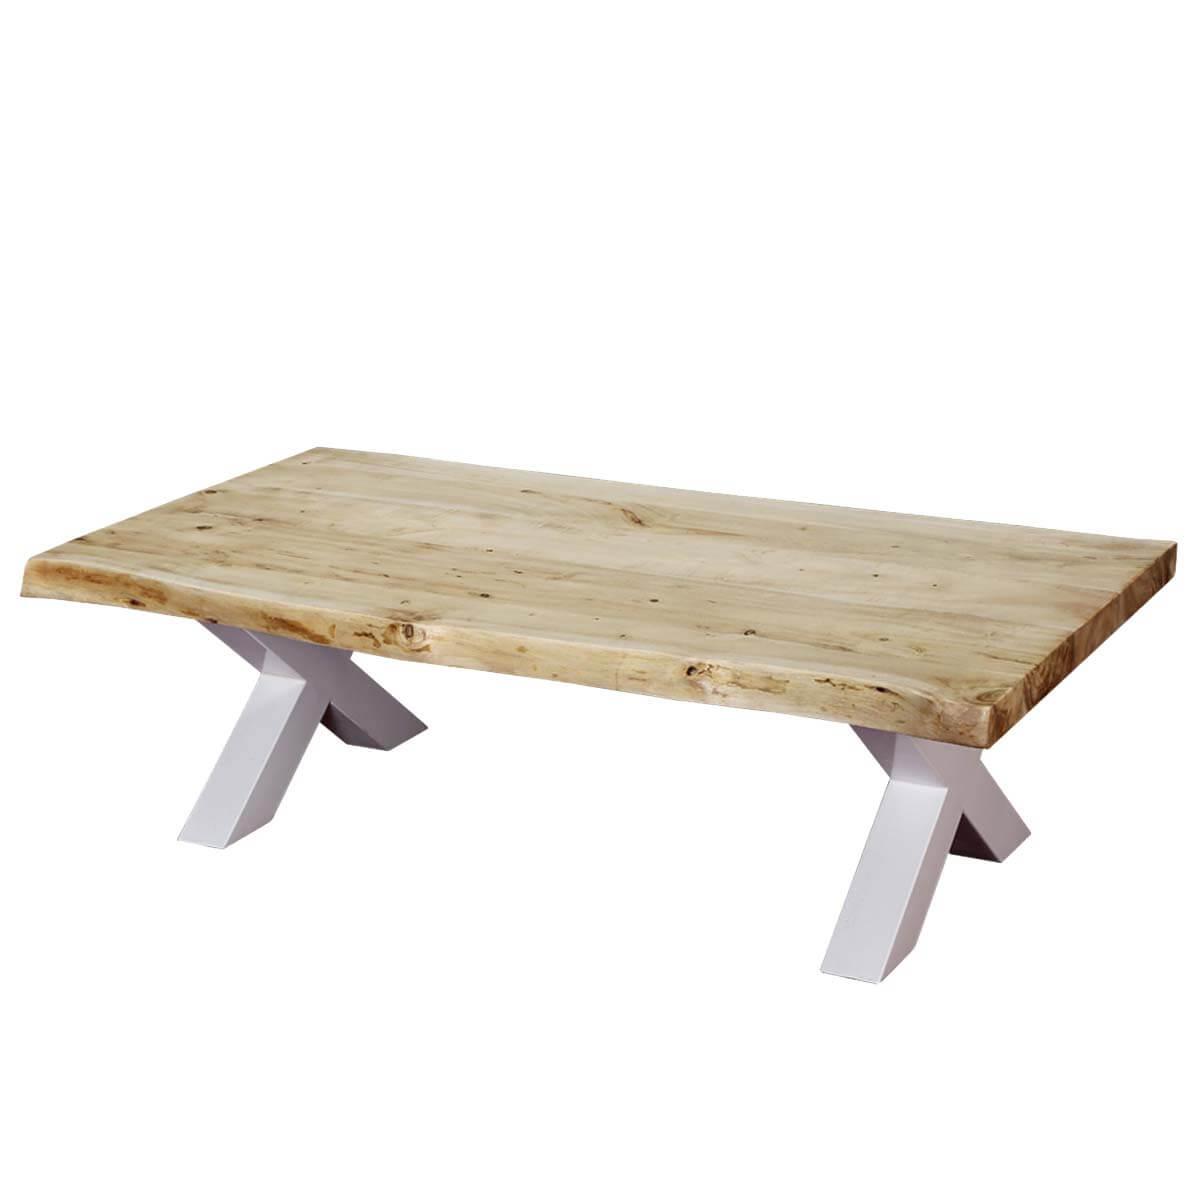 "Picnic Style Acacia Wood & Iron 51"" Live Edge Coffee Table"